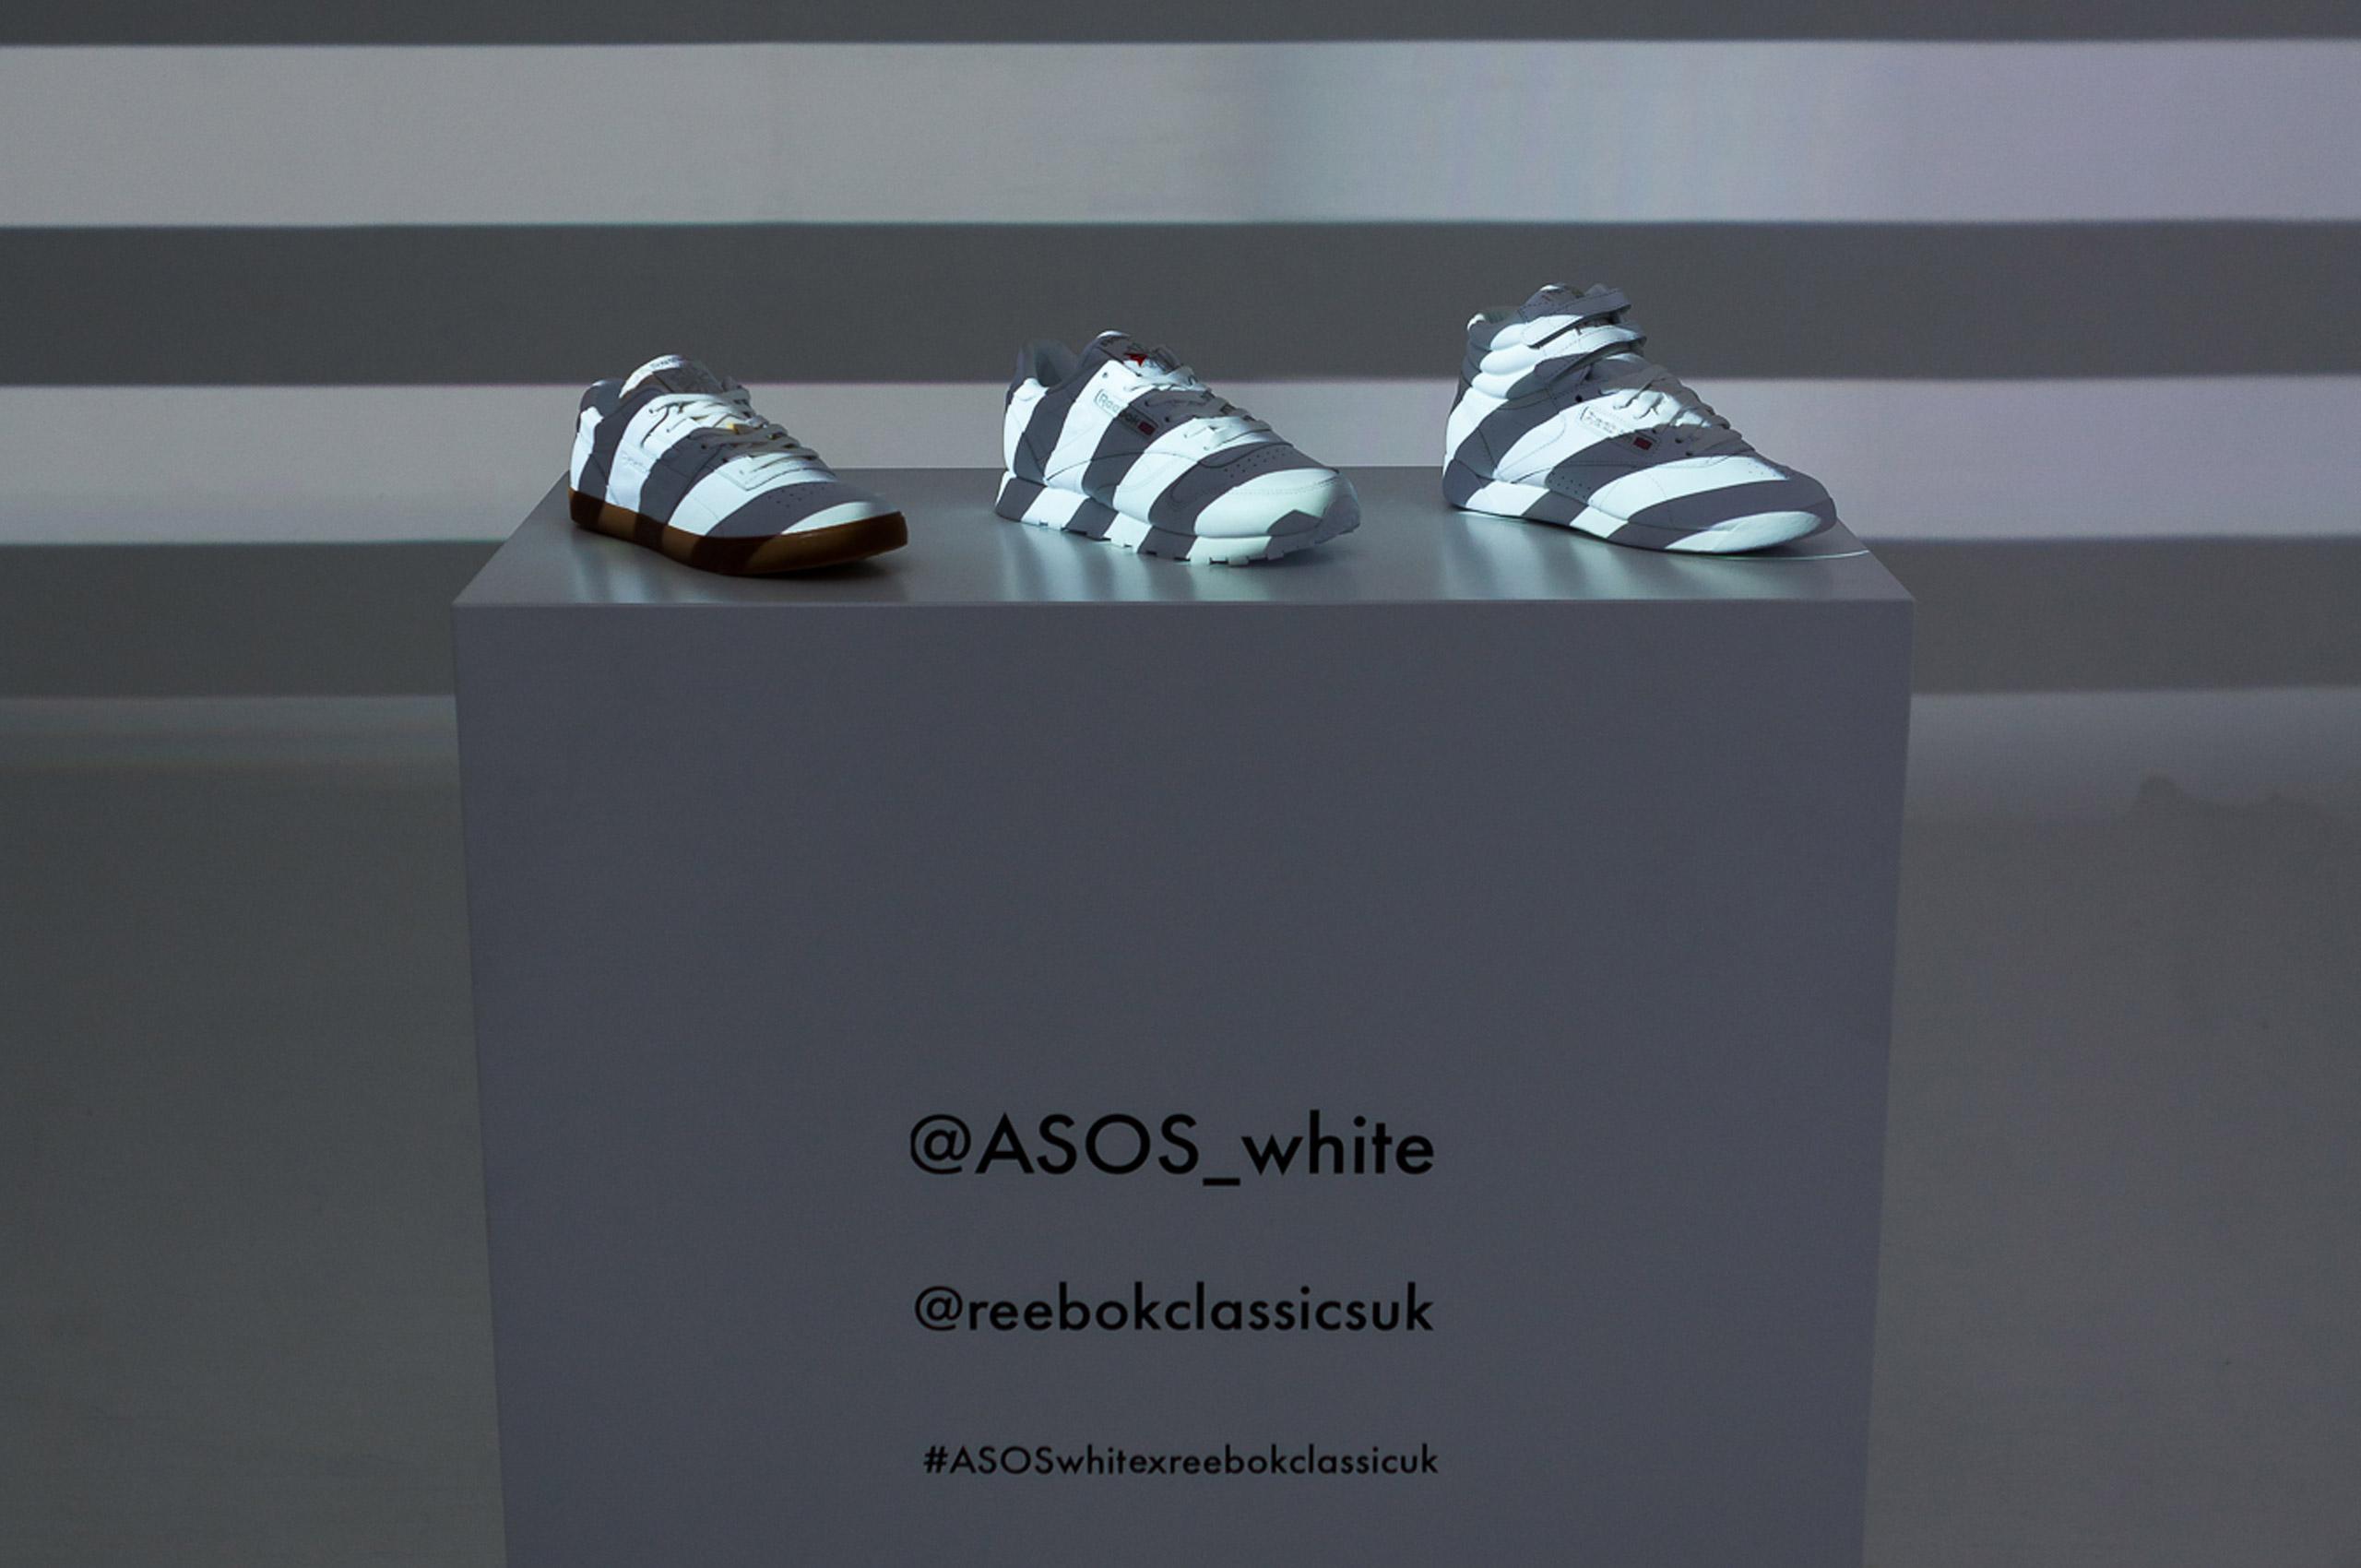 ASOS White X Reebok Classic Collaboration – Icetank Venue